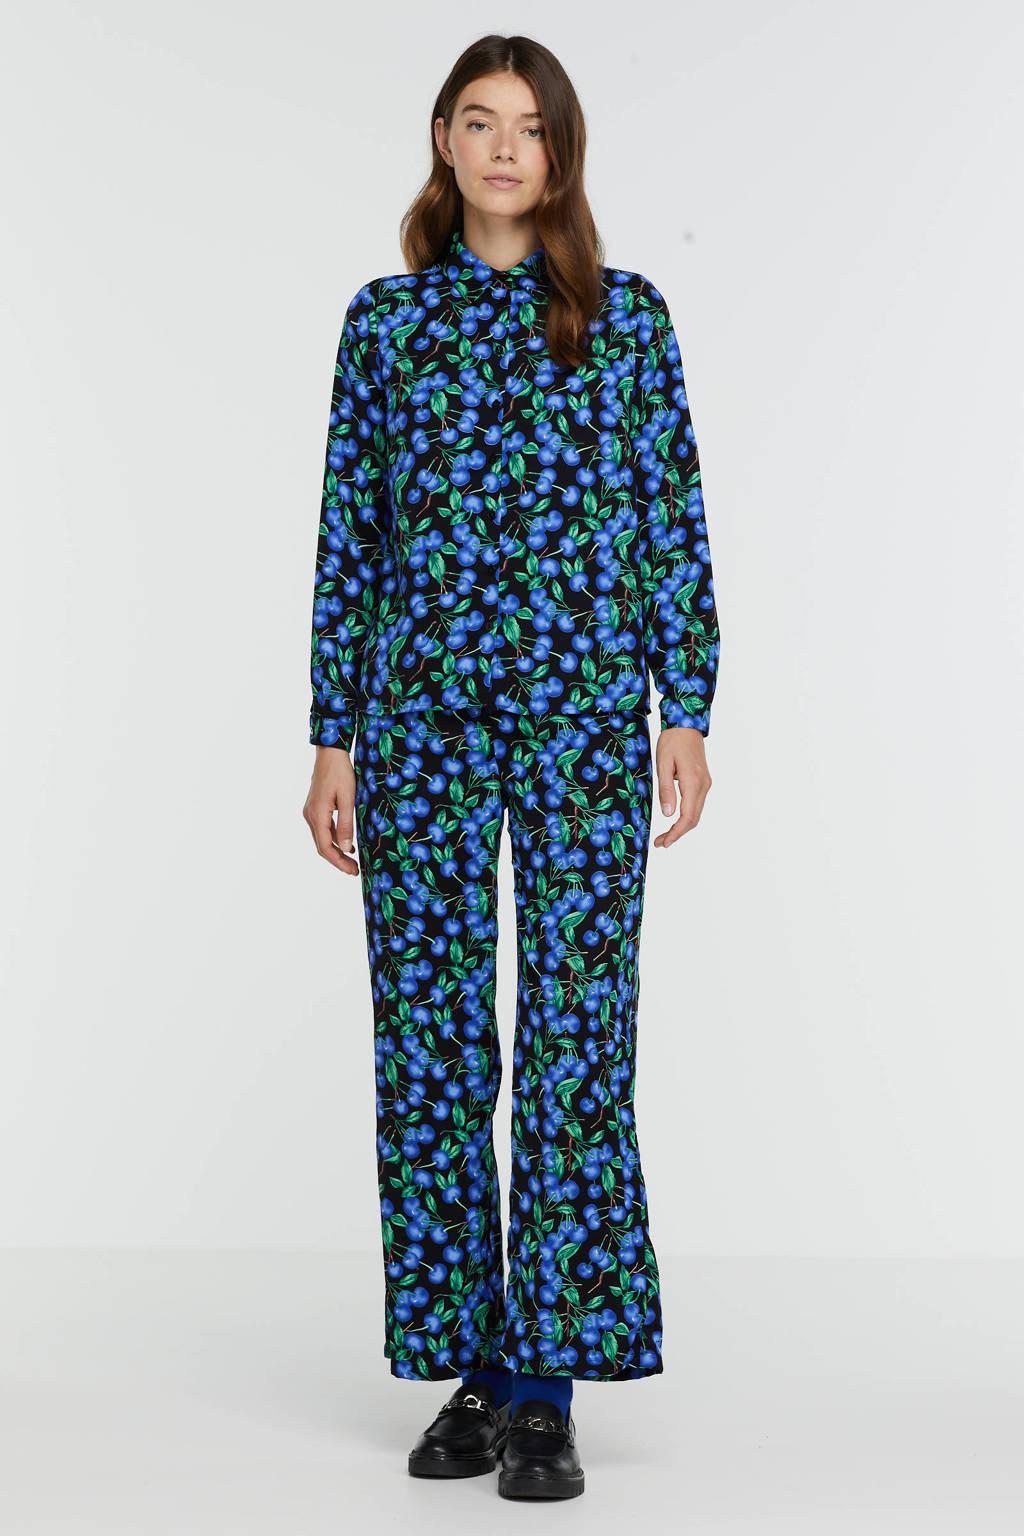 SisterS Point blouse Elba-sh2 met all over print zwart/blauw, Zwart/blauw